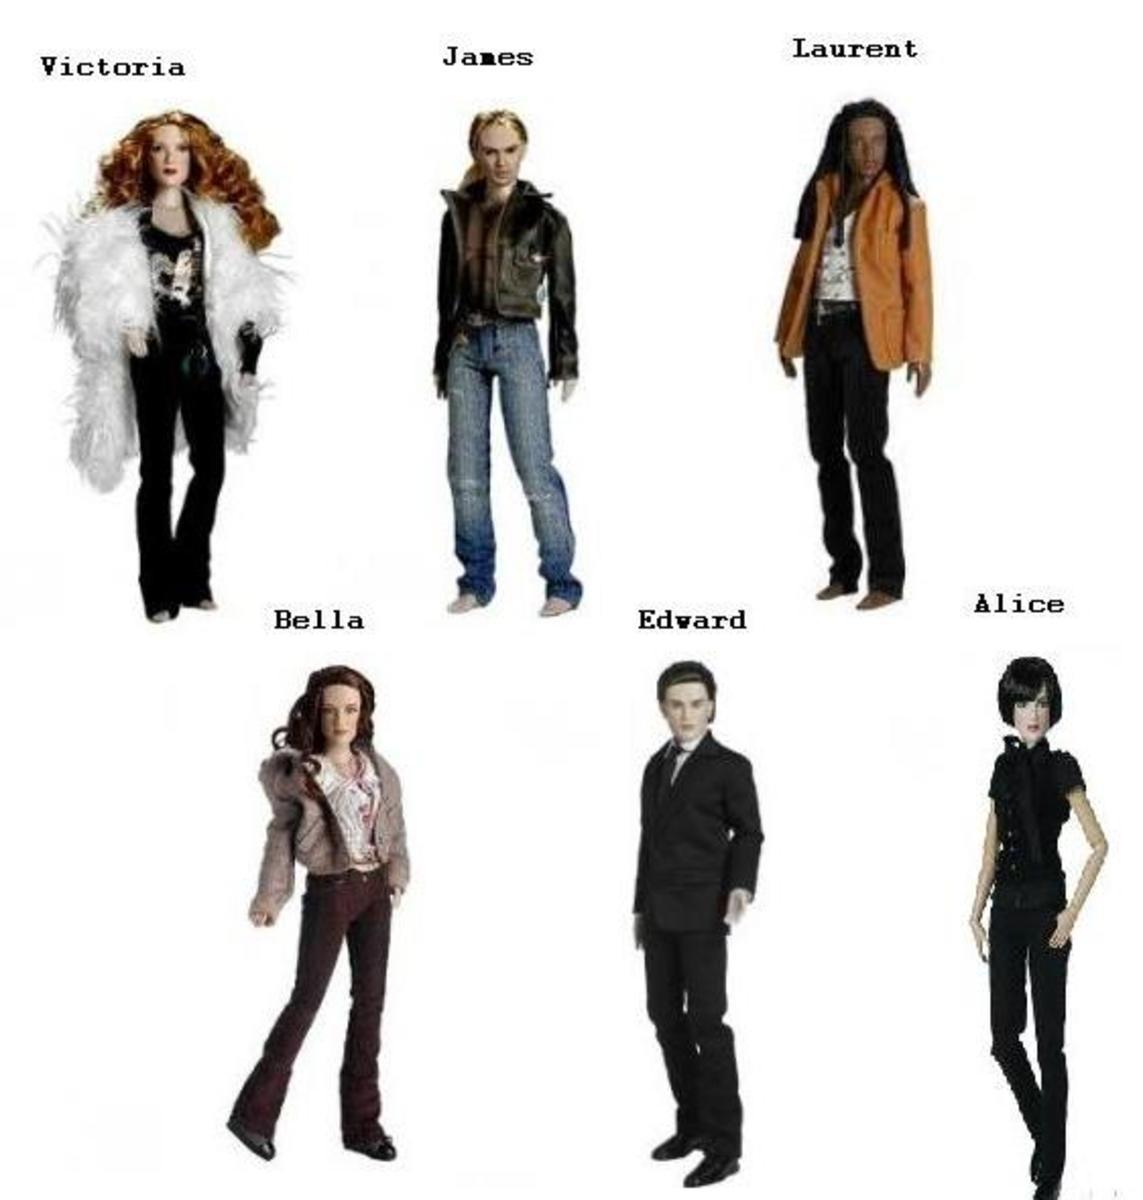 Twilight Saga Tonner Dolls - Edward Cullen, Bella Swan, Jacob Black,Victoria, James, Laurent, Jasper Hale, Alice